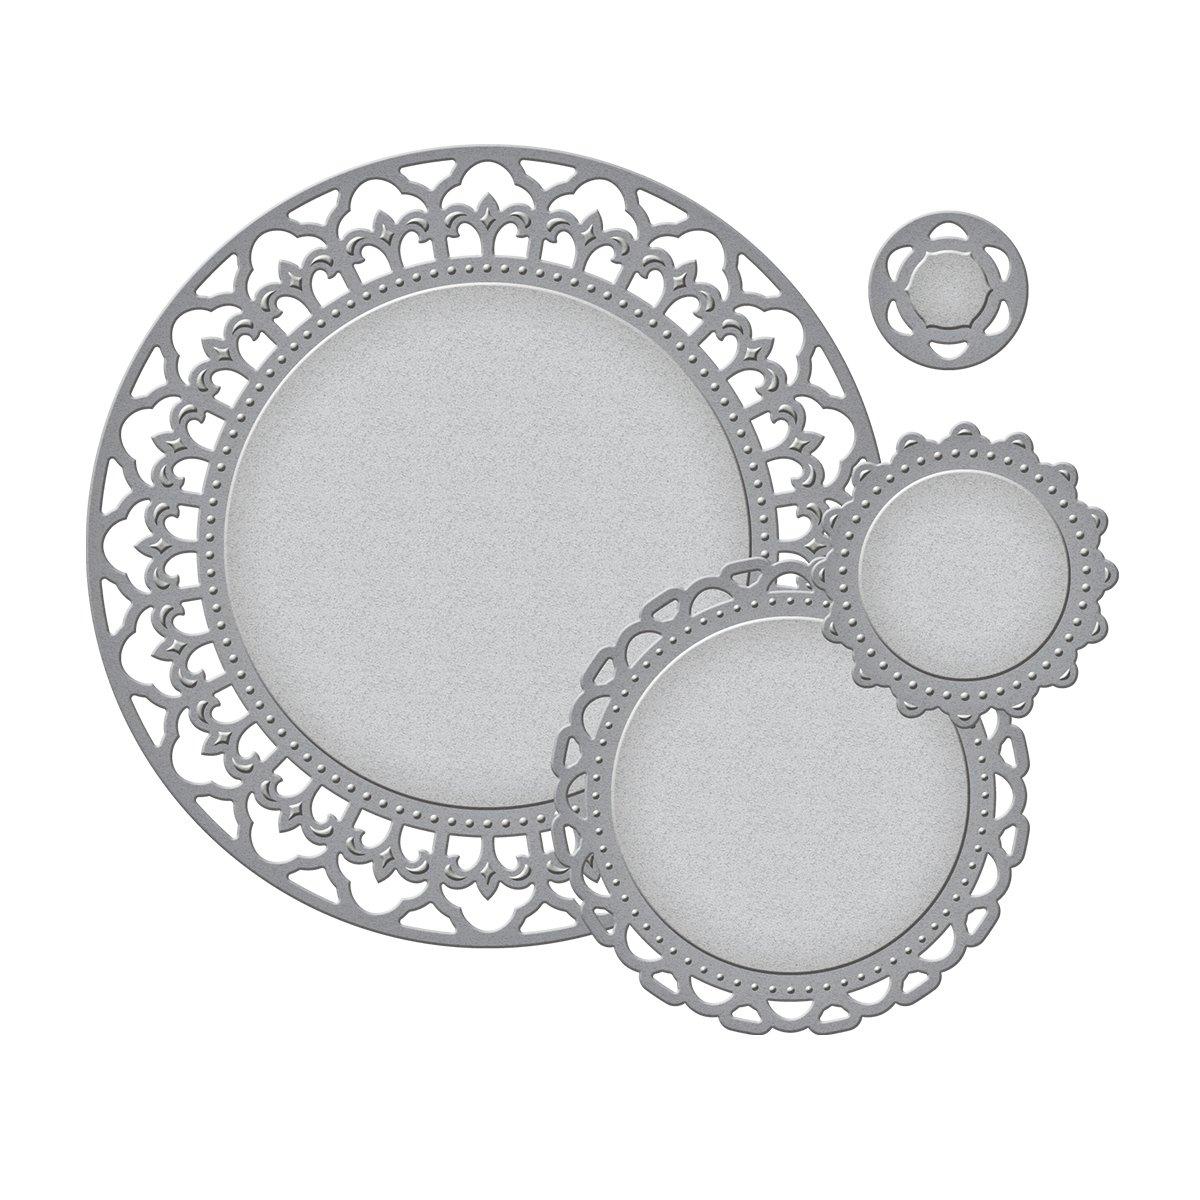 Spellbinders S4-354 Nestabilities Decorative Elements Splendid Circles Die Templates